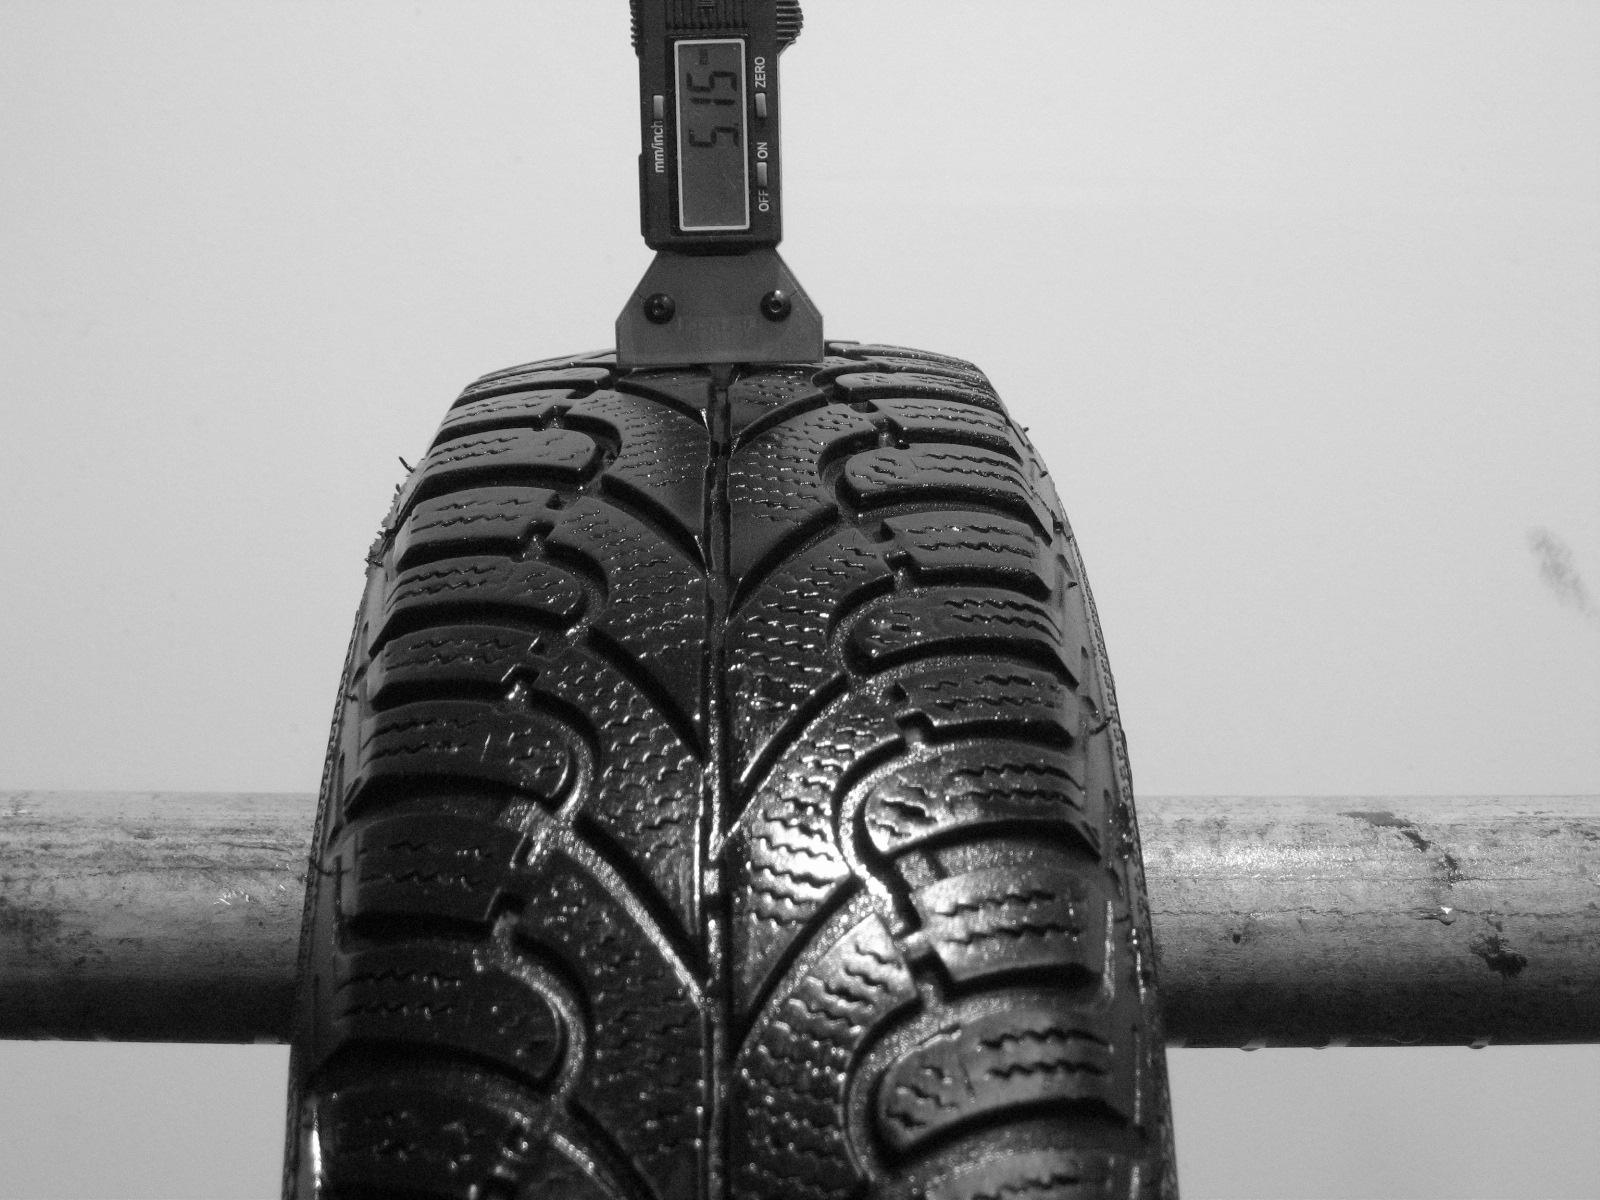 Použité-Pneu-Bazar - 155/70 R13 FULDA KRISTALL MONTERO -kusovka-rezerva 3mm